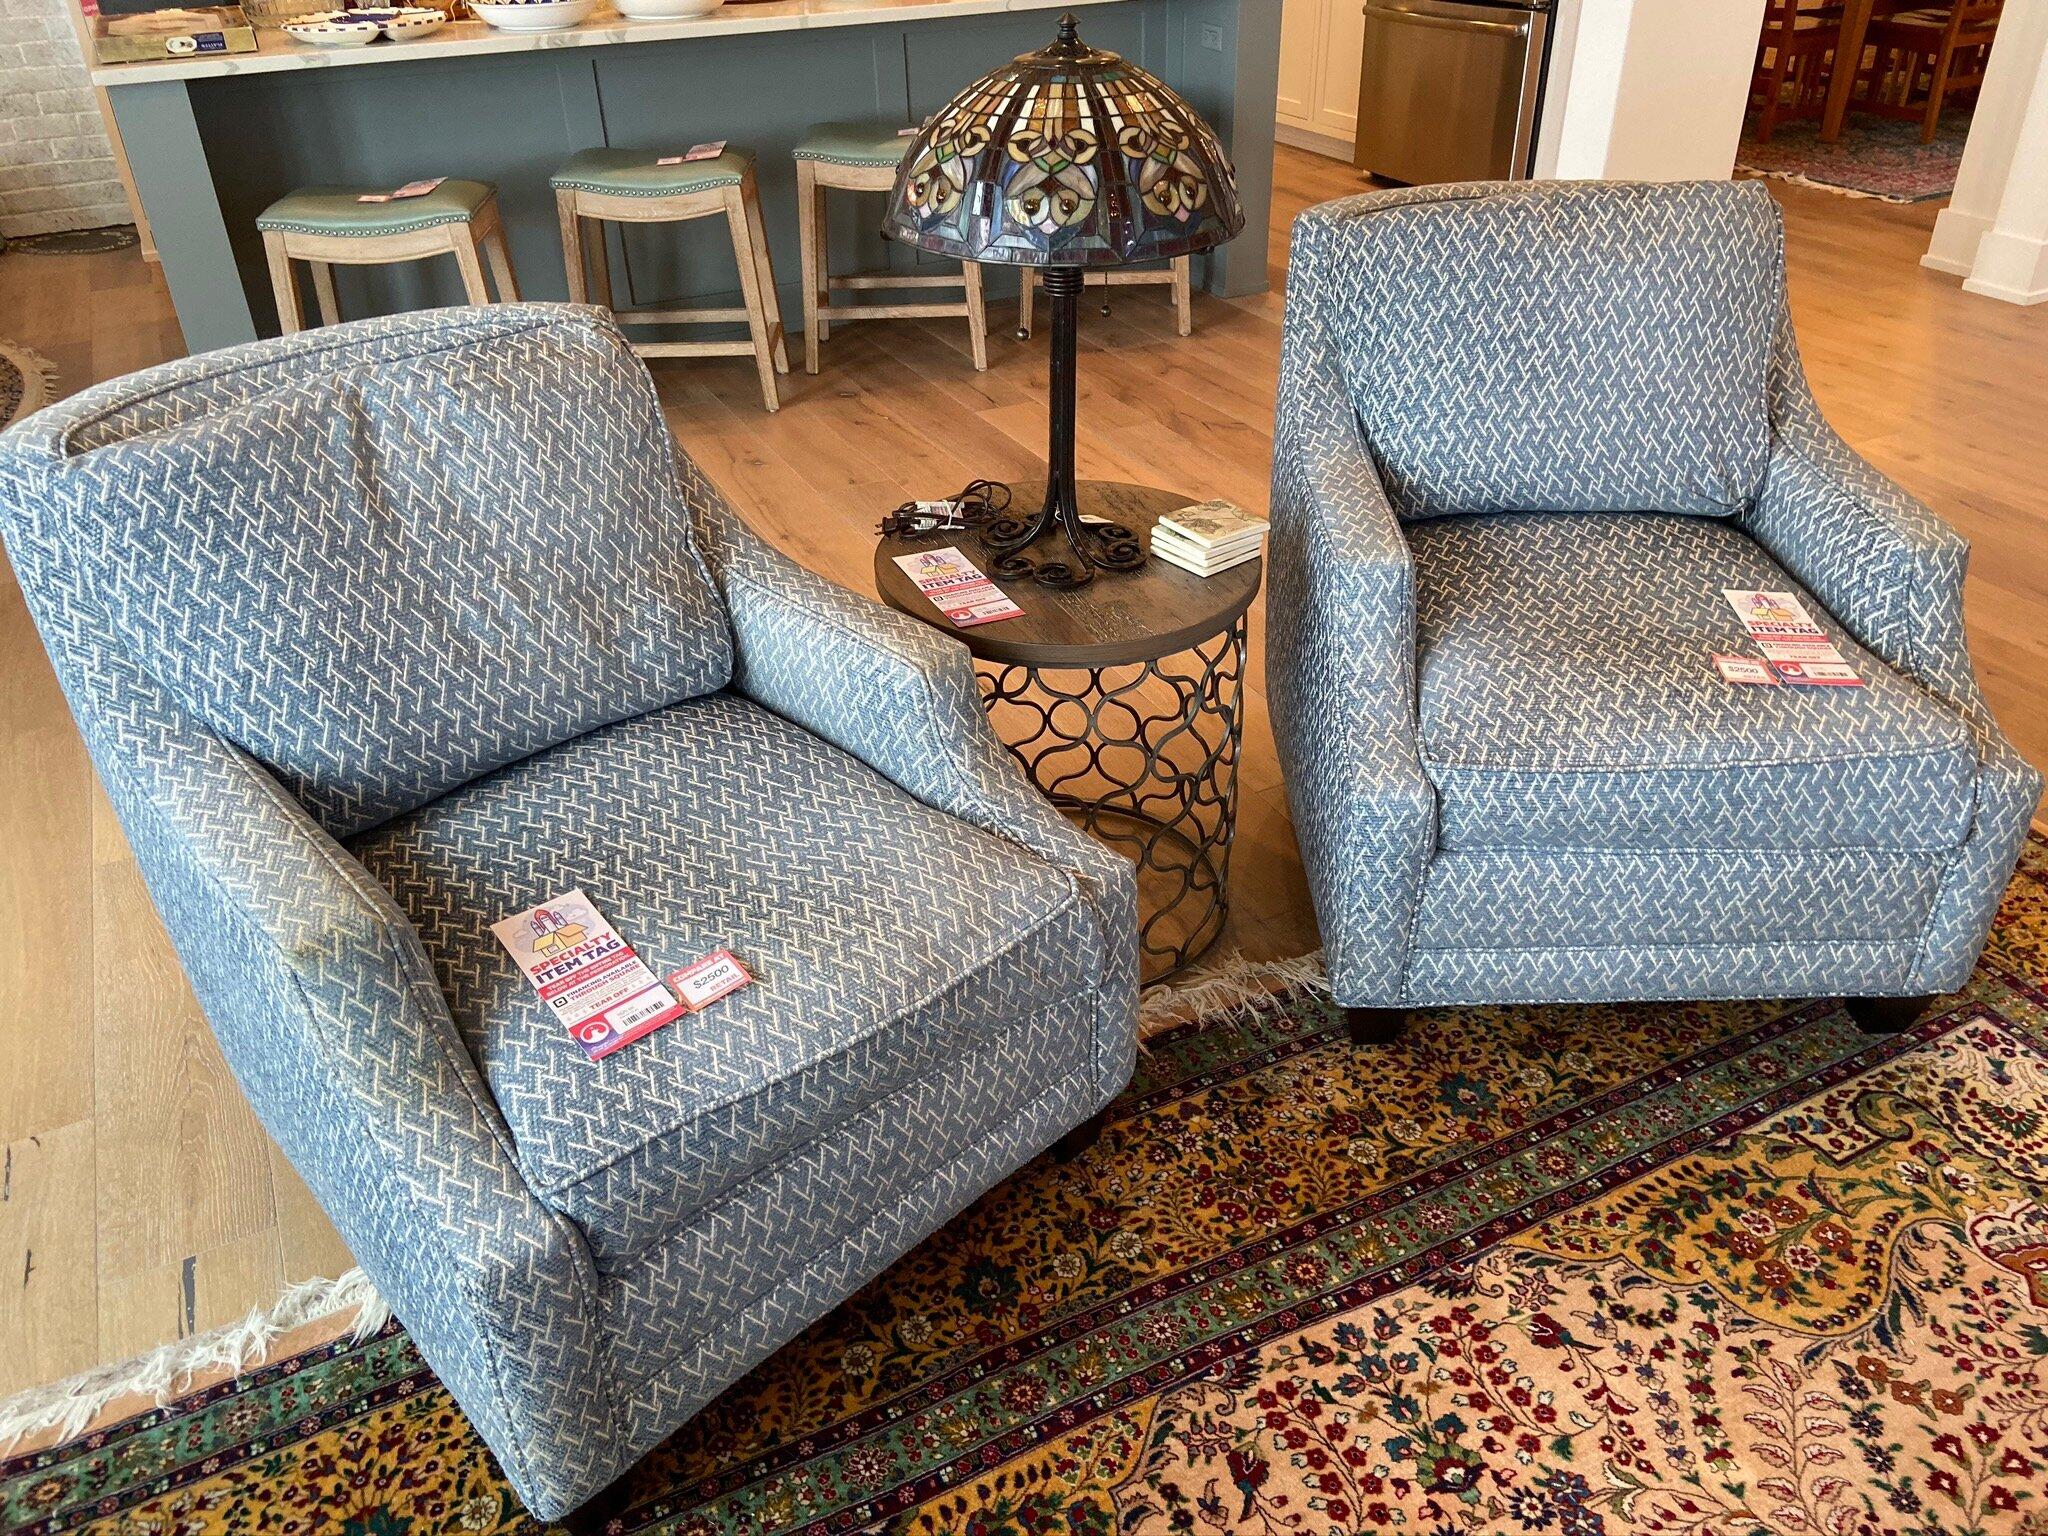 6000sq F Modern Farmhouse Full Of Furniture Home Accents